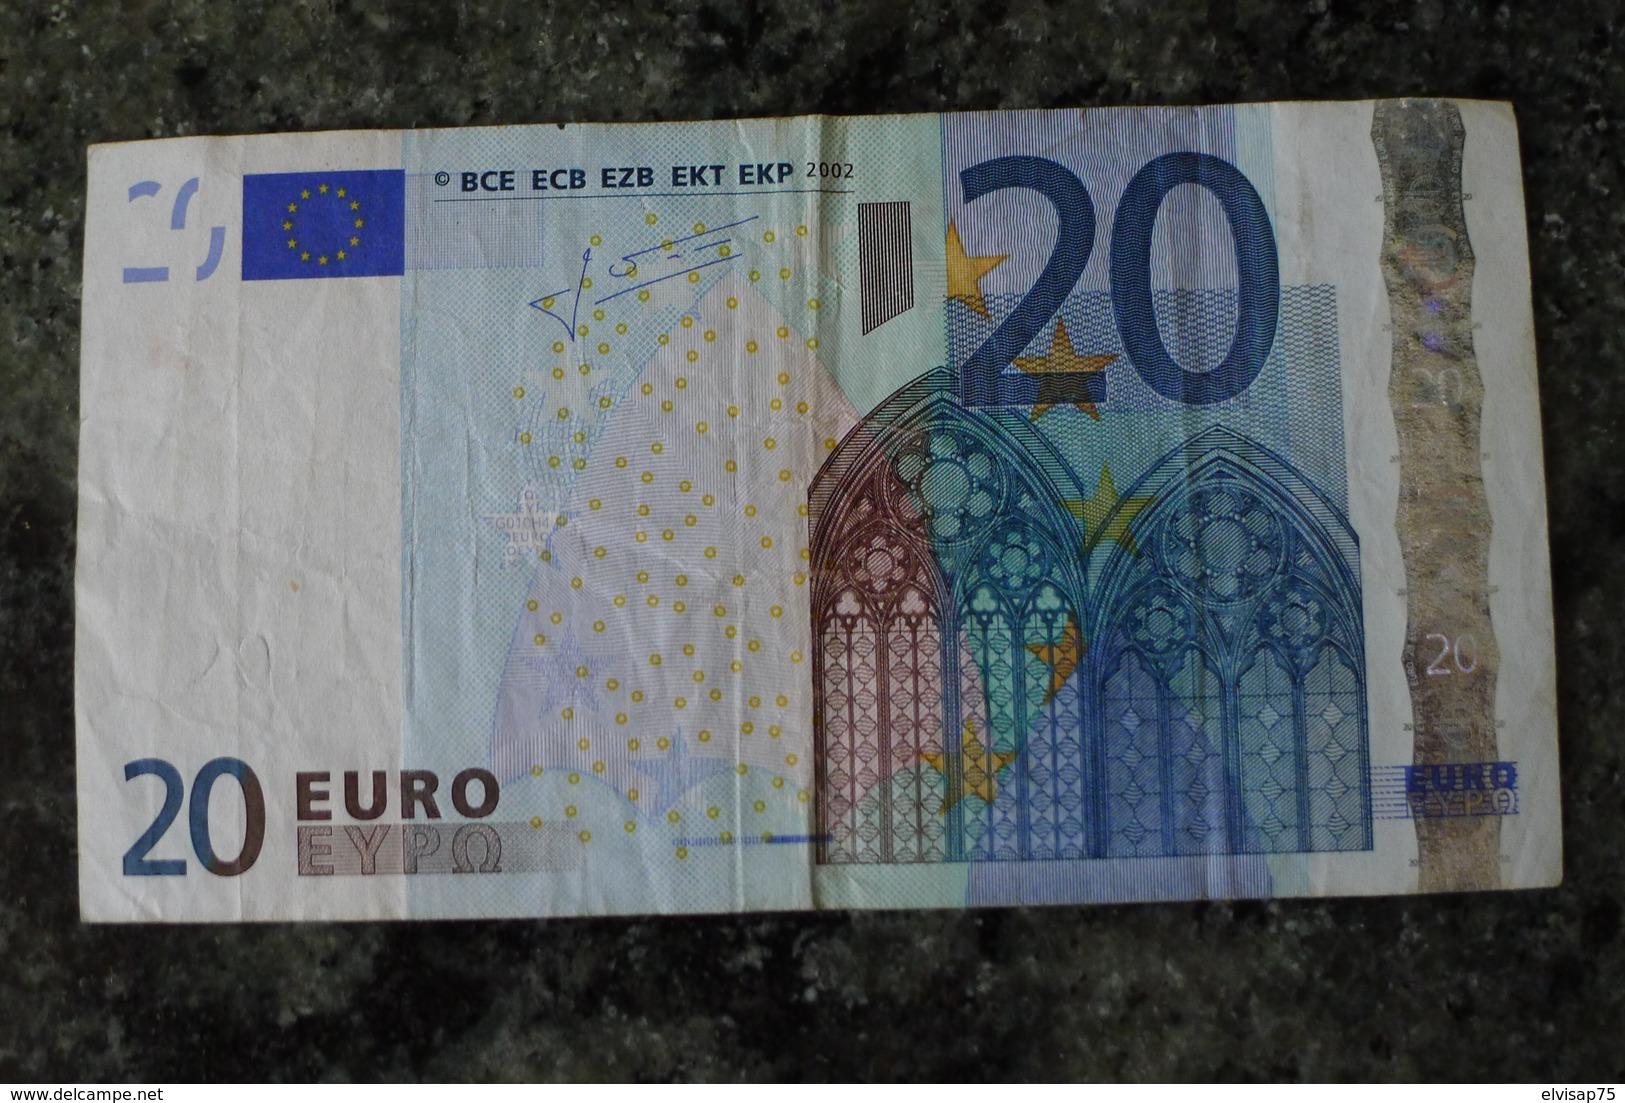 RRR VERY RARE 20 EURO G CYPRUS TRICHET G010H4 - EURO